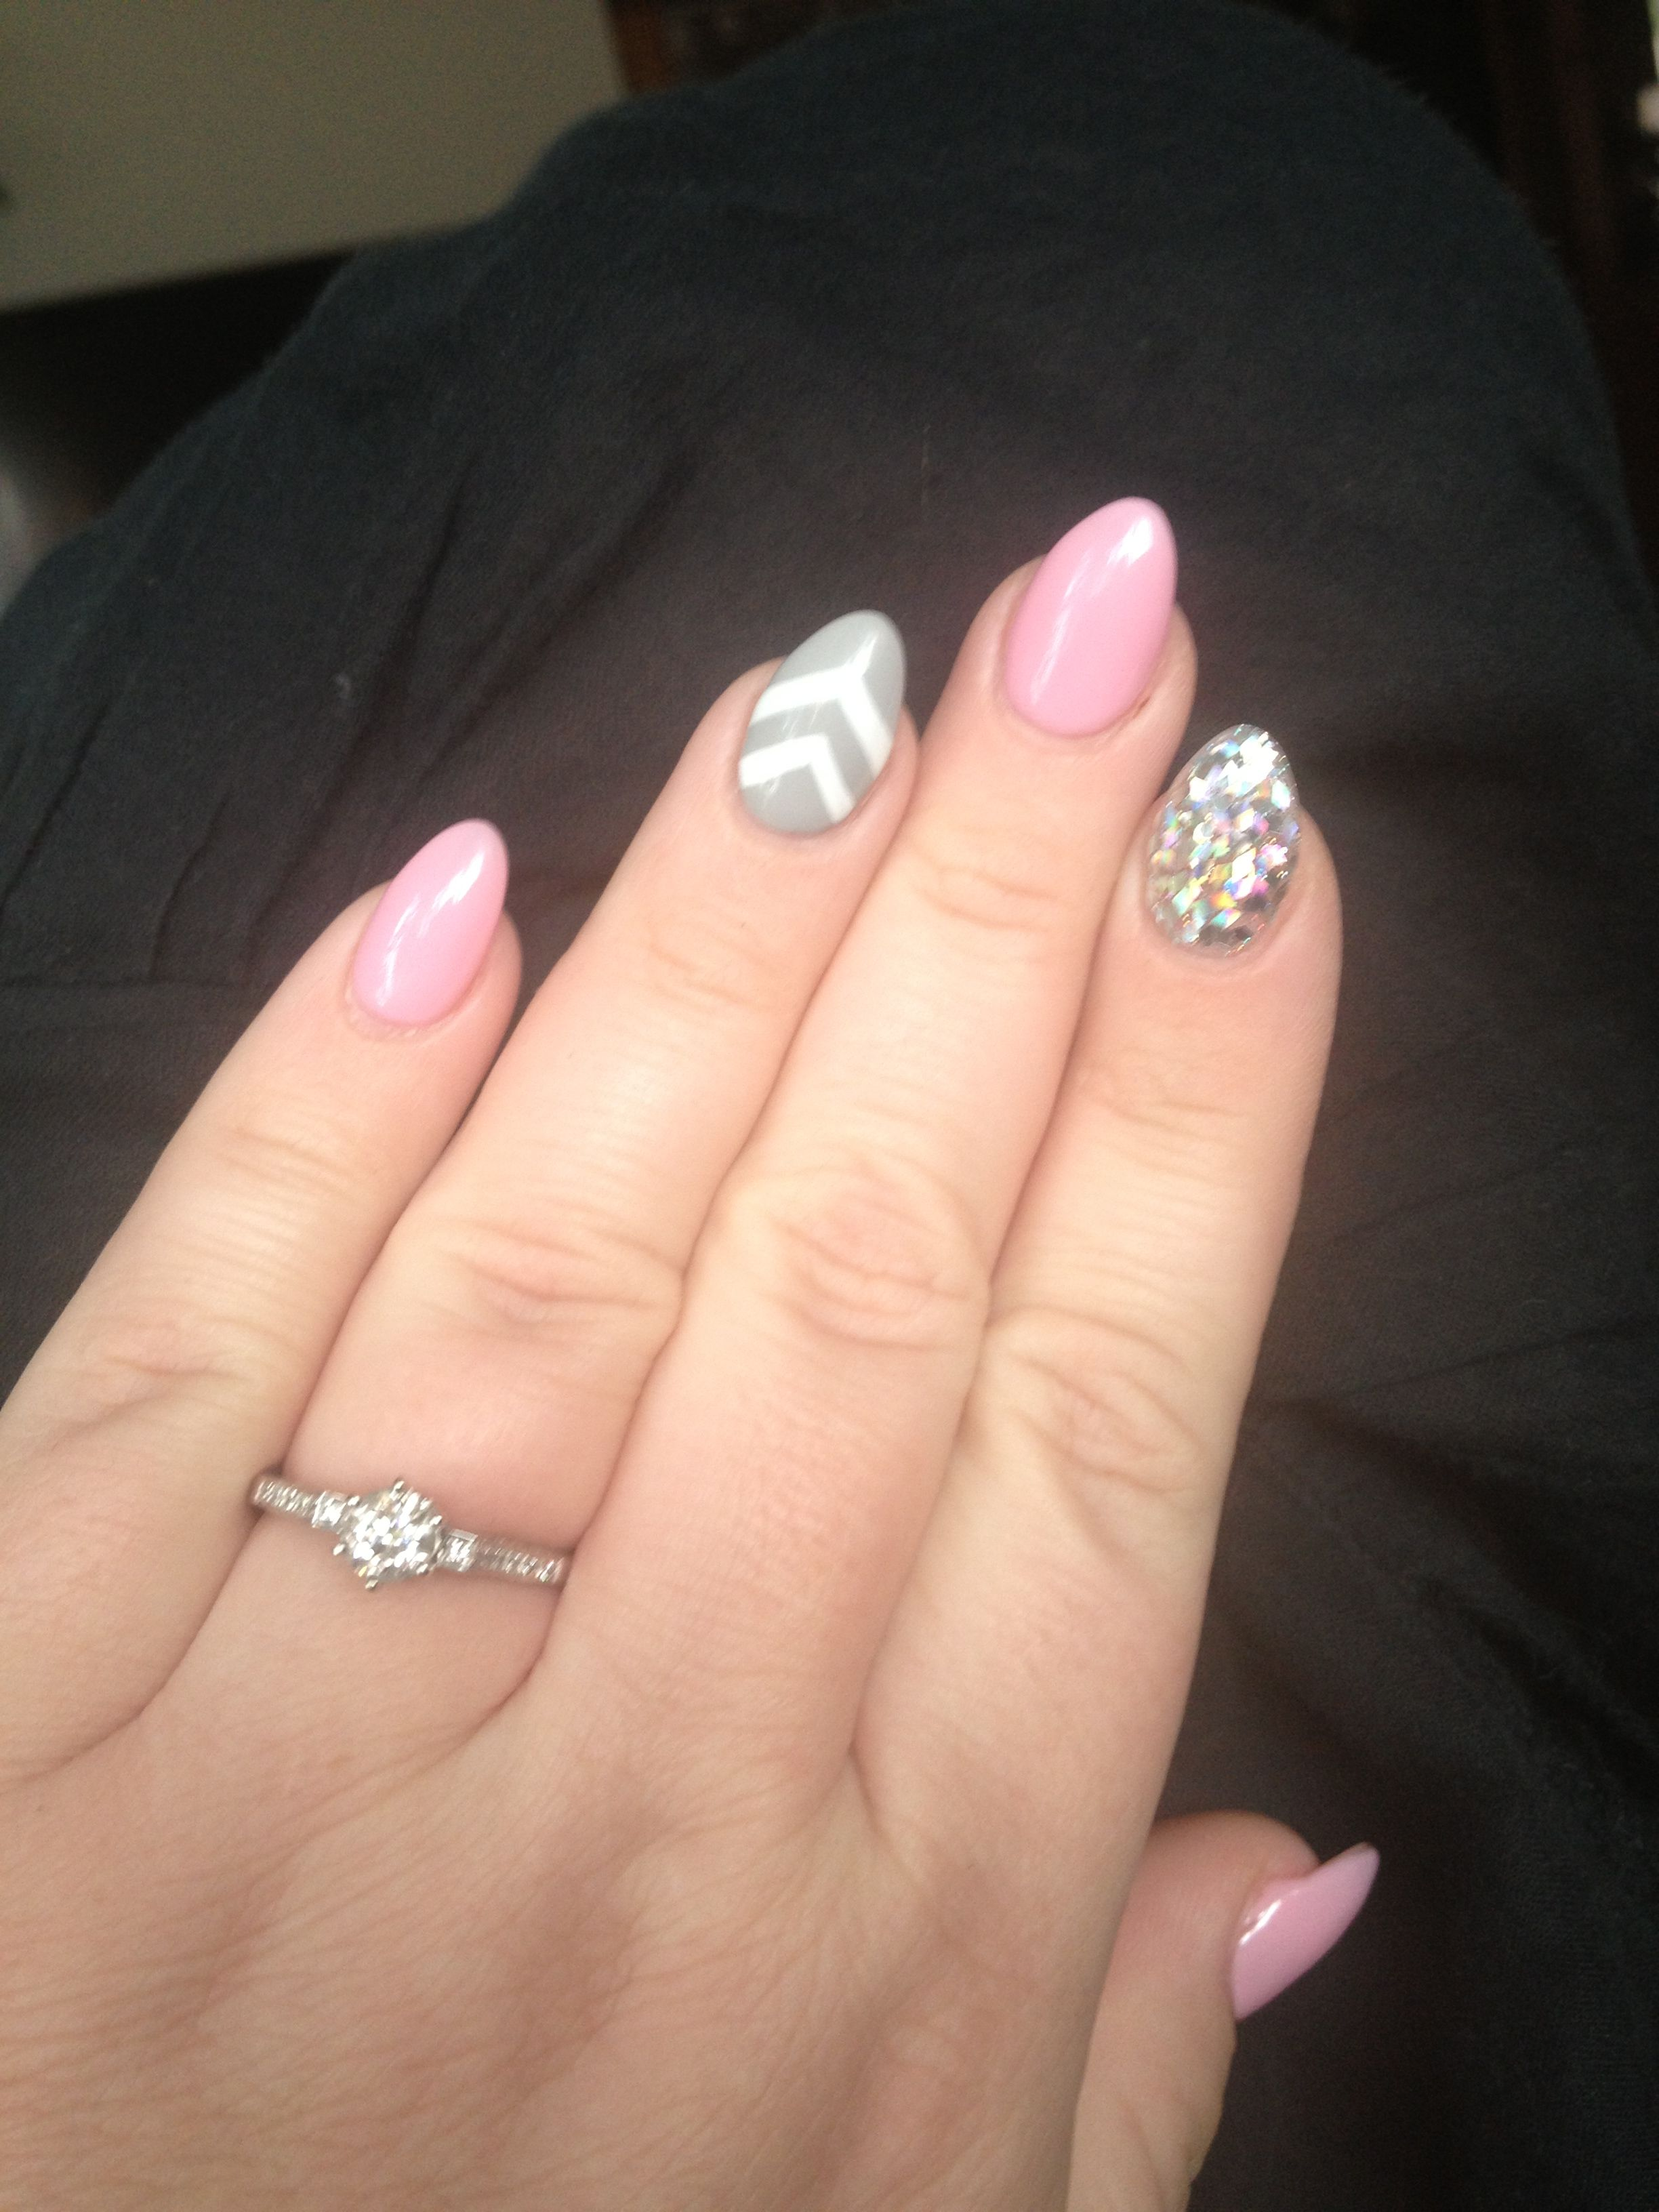 Almond Nails | Nail | Pinterest | Nailart und Fingernägel